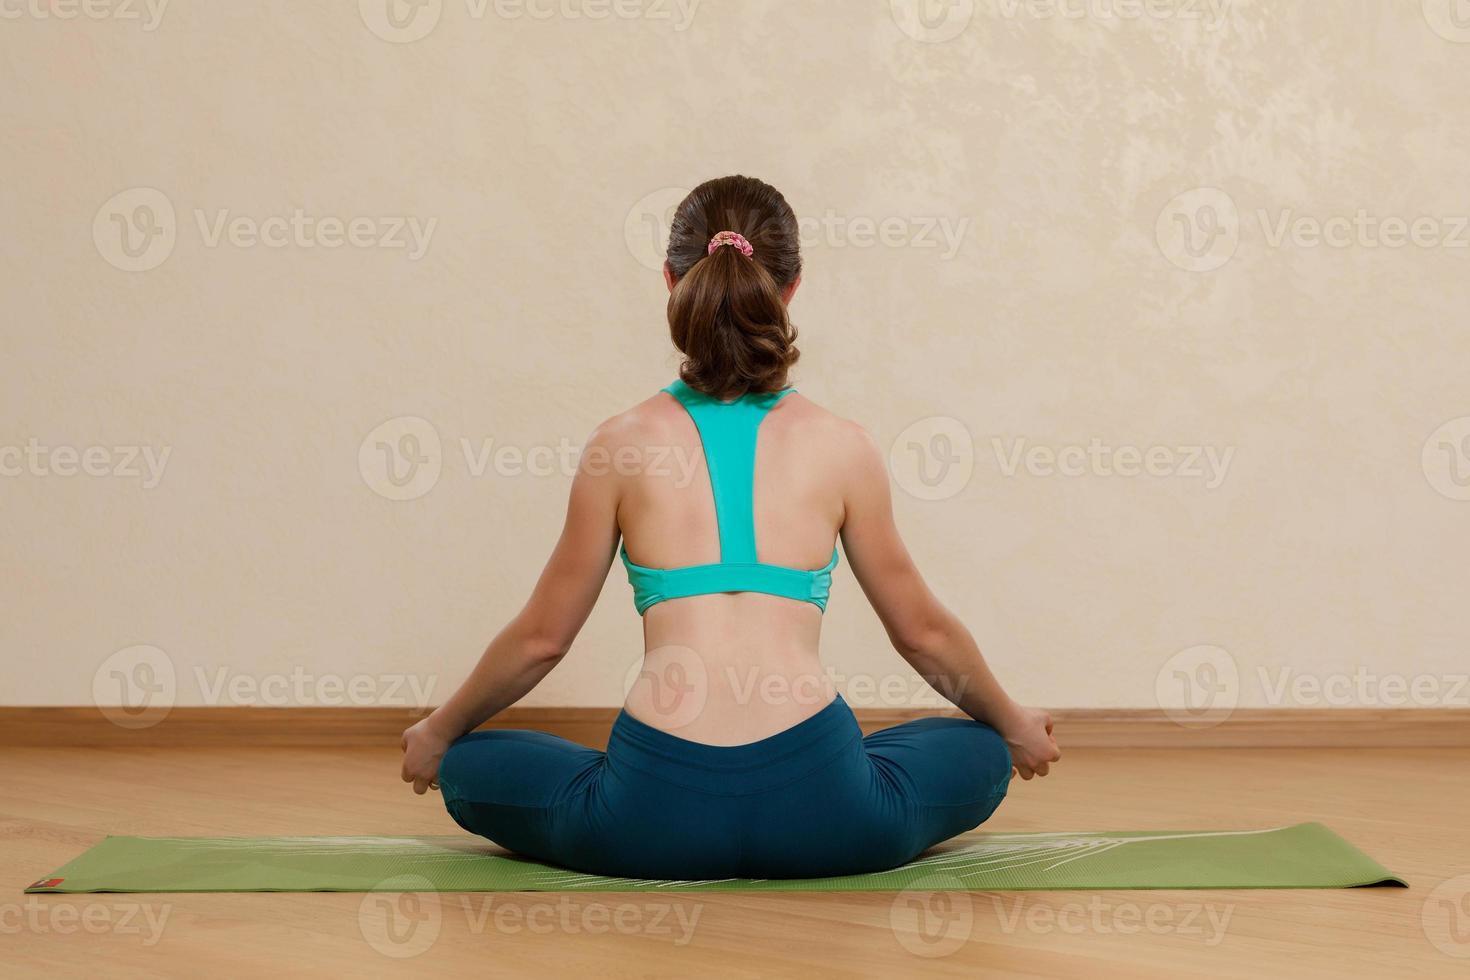 kaukasische Frau praktiziert Yoga im Studio (sukkhasana) foto